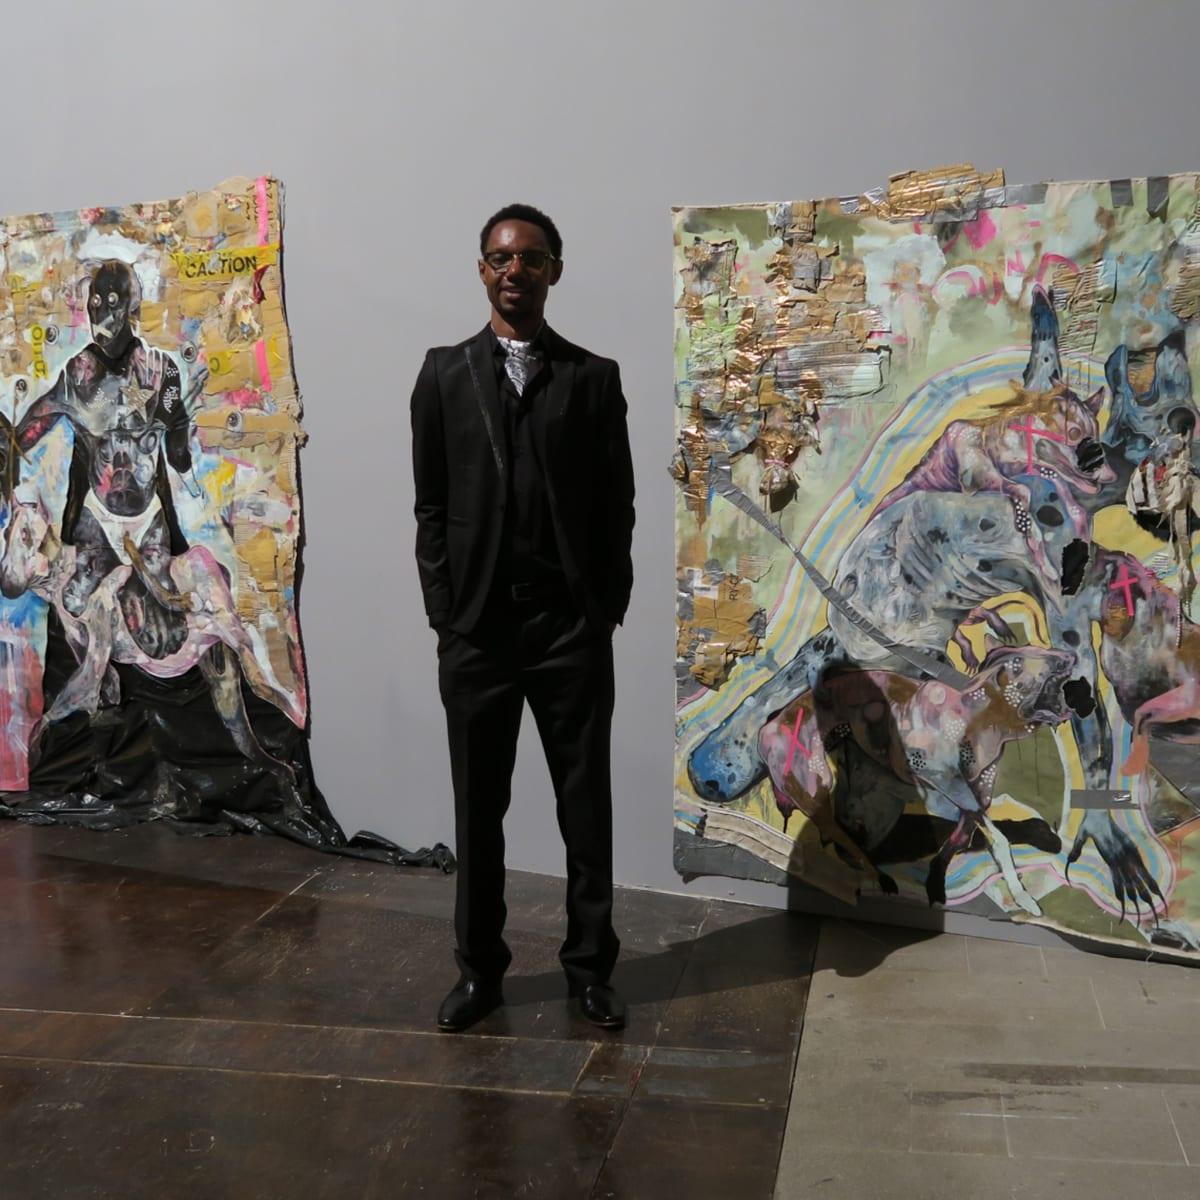 56th Venice Biennale, Italy